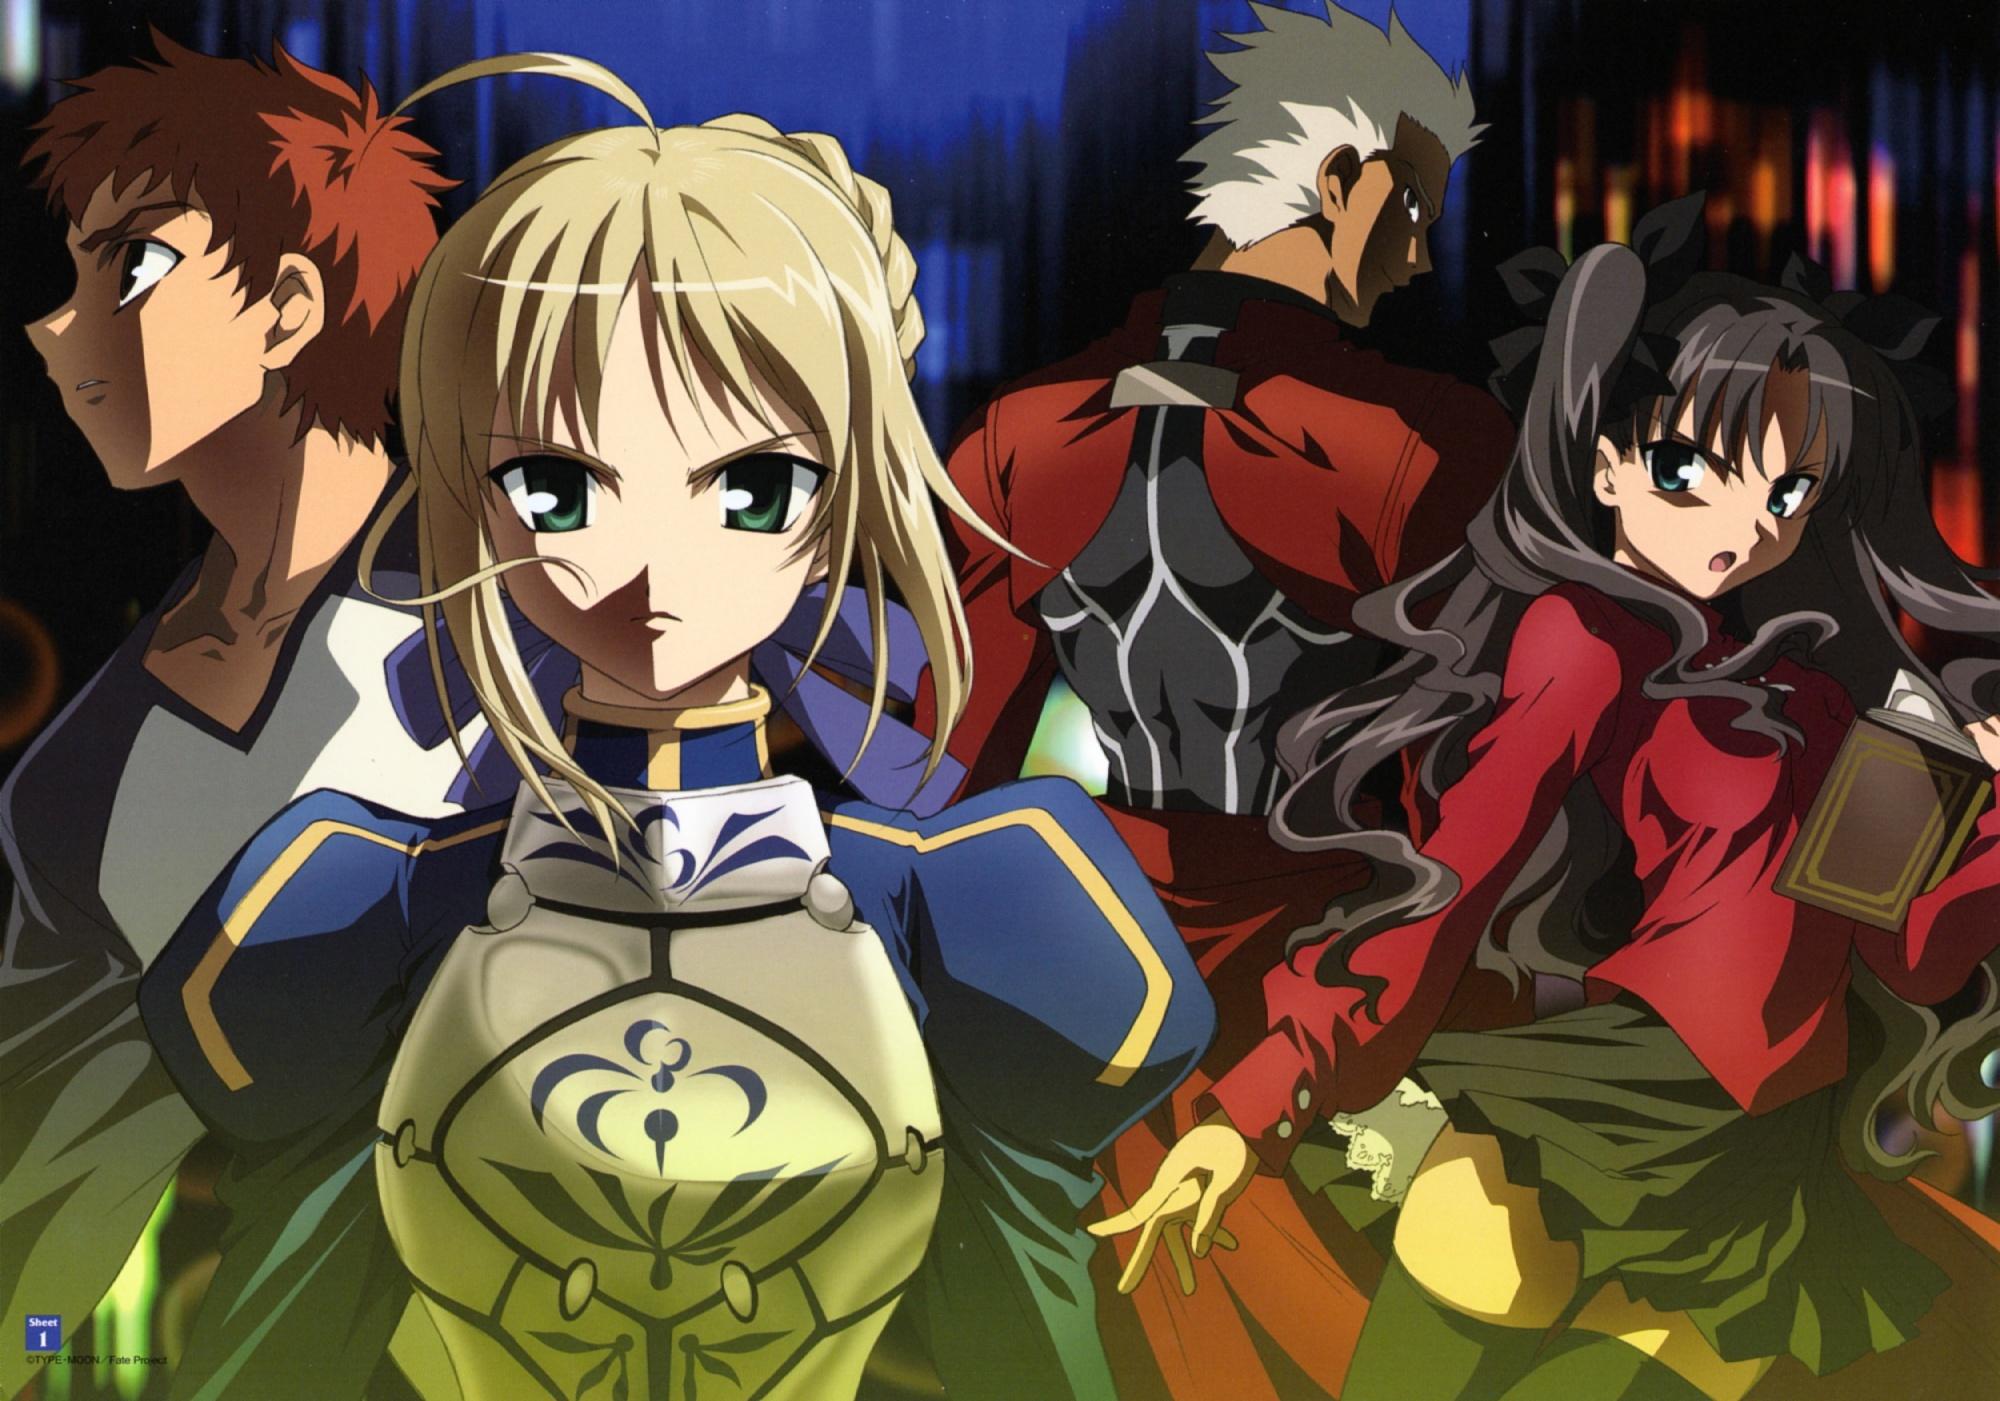 Fate/stay night Anime'' Diretor Yuji Yamaguchi Falece